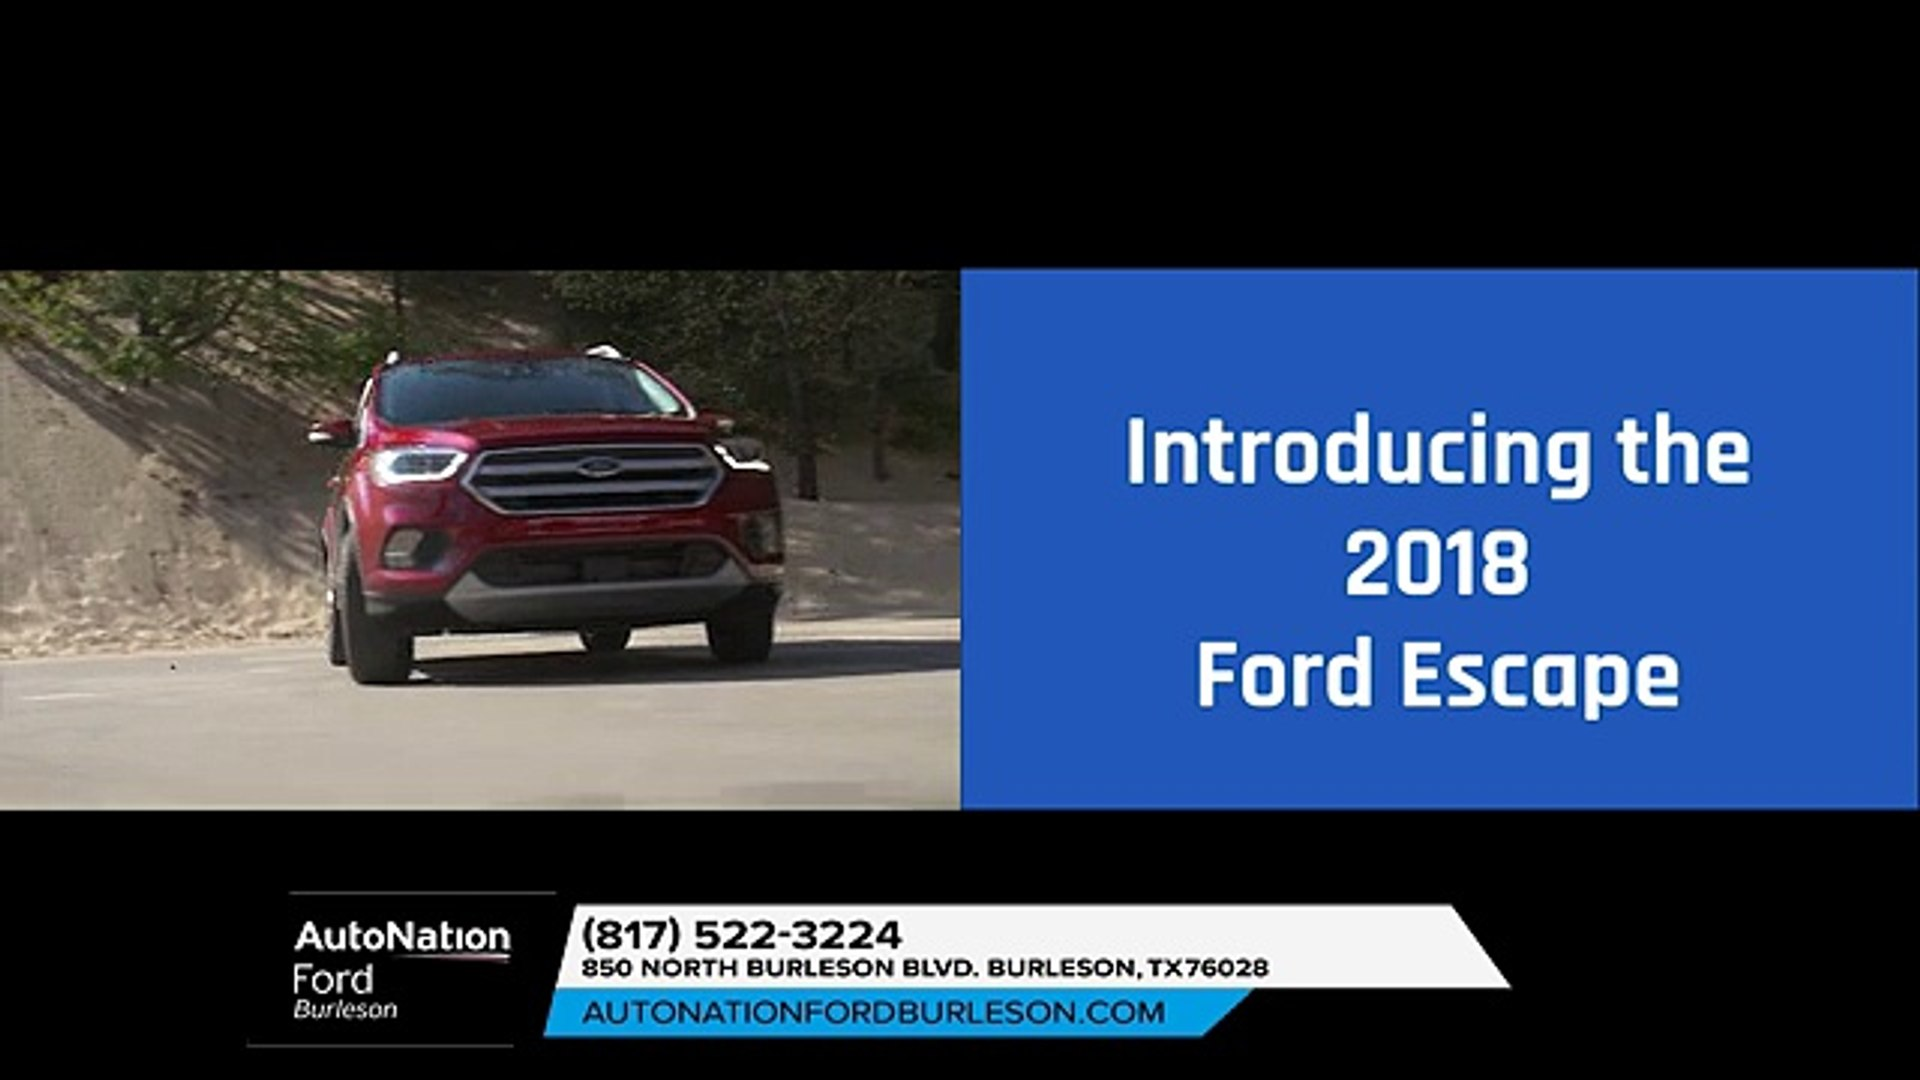 Autonation Ford Burleson >> Ford Escape Arlington Tx 2018 Ford Escape Arlington Tx